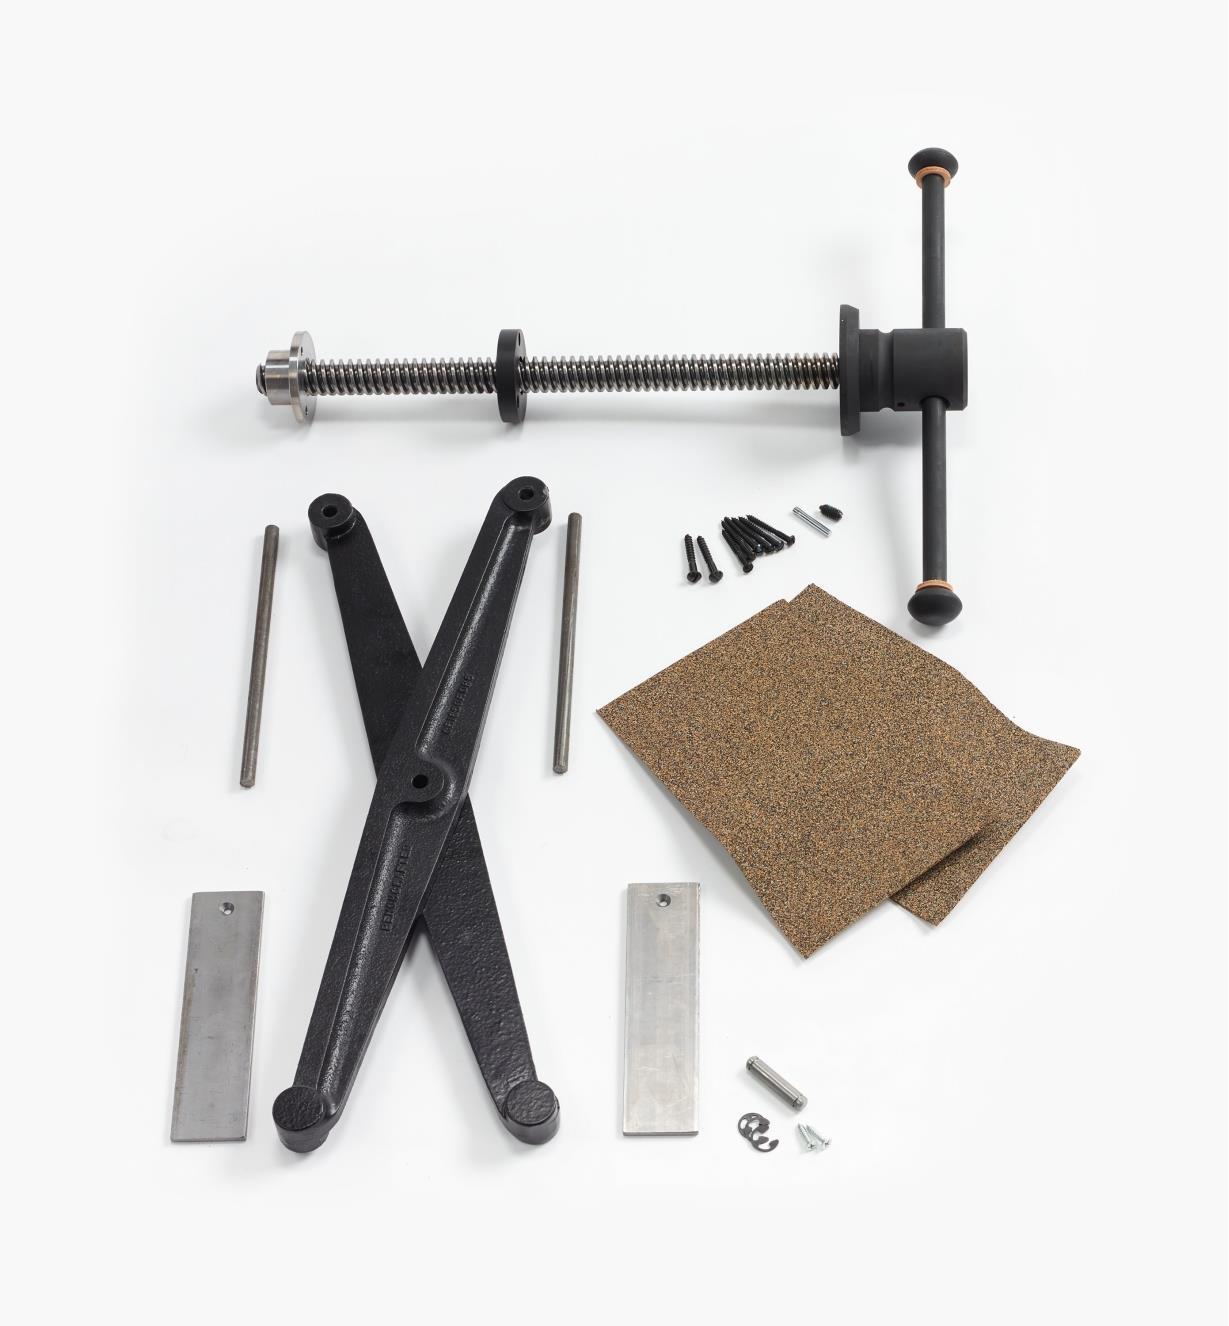 06G0160 - Ensemble Criscross Solo pour presse verticale parallèle Benchcrafted